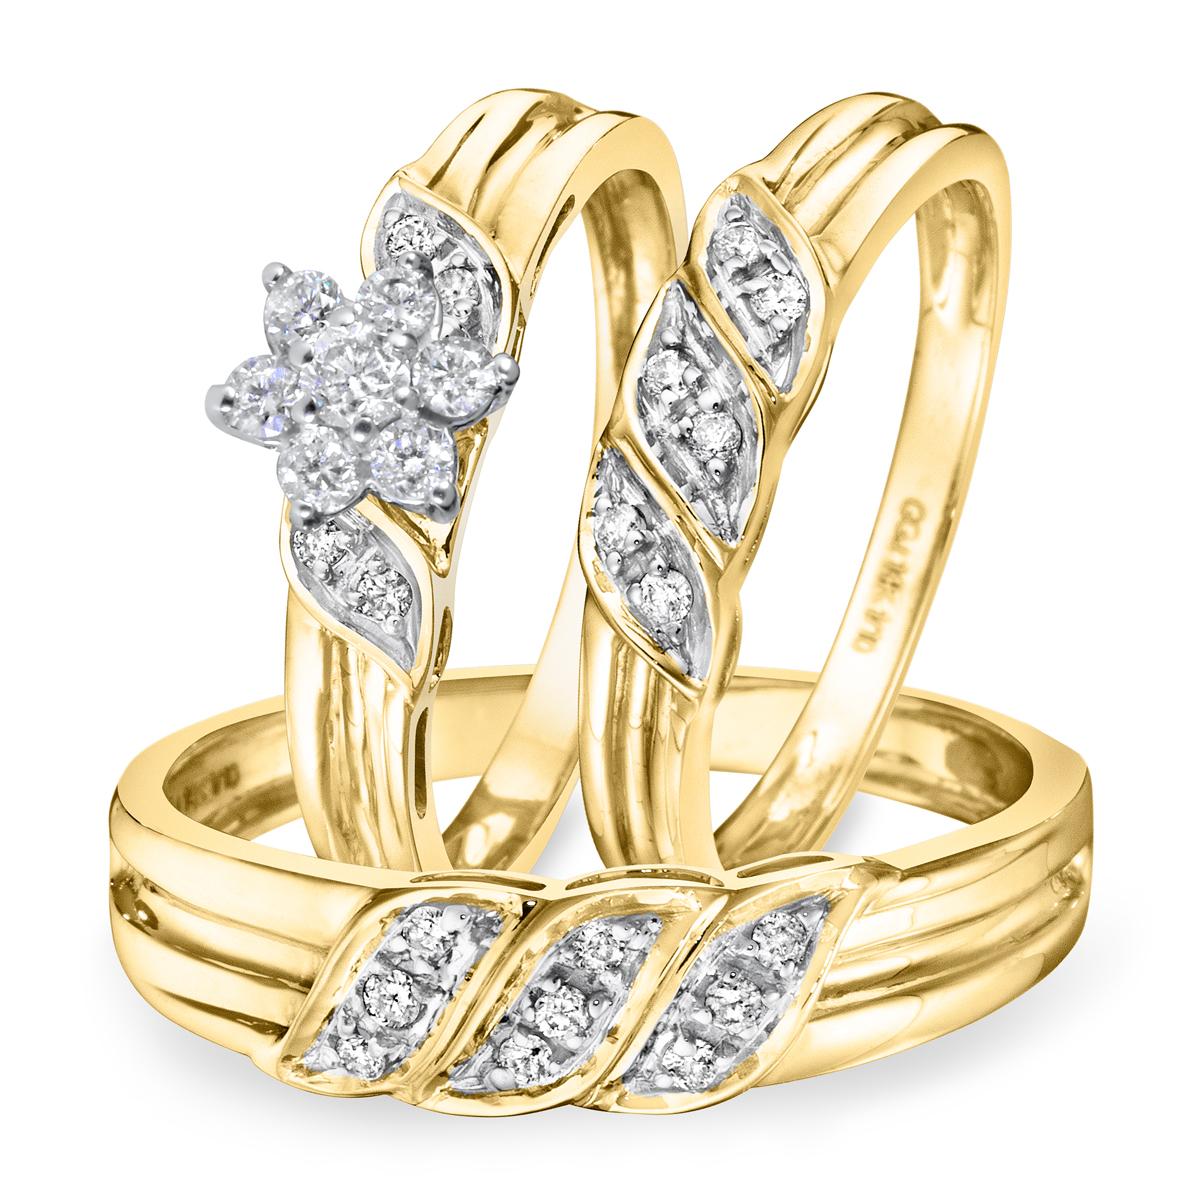 3/8 CT. T.W. Diamond Ladies Engagement Ring, Wedding Band, Men's Wedding Band